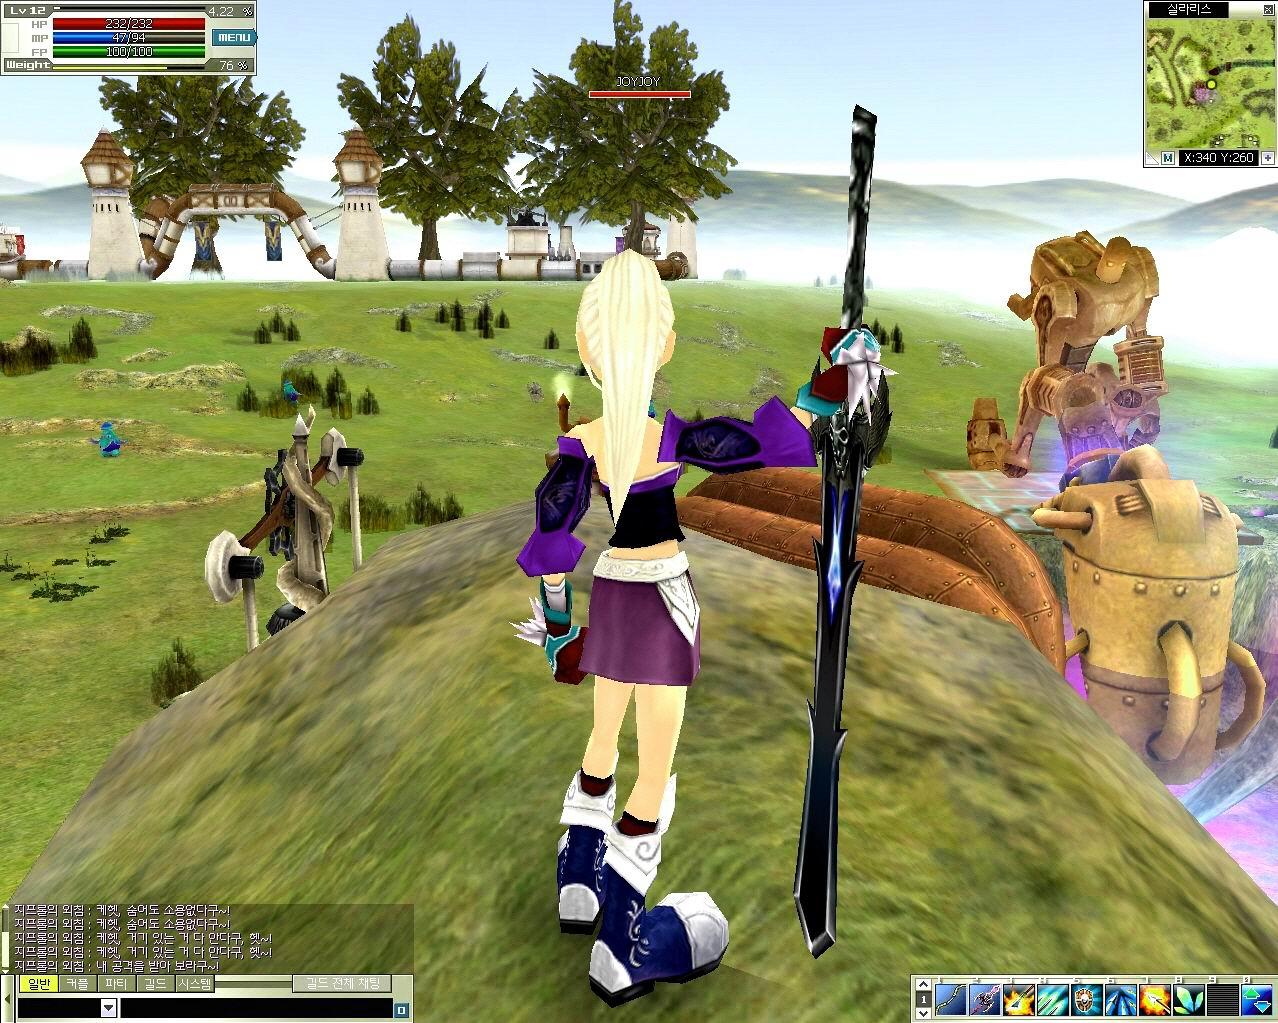 《Micmac Online》游戏画面